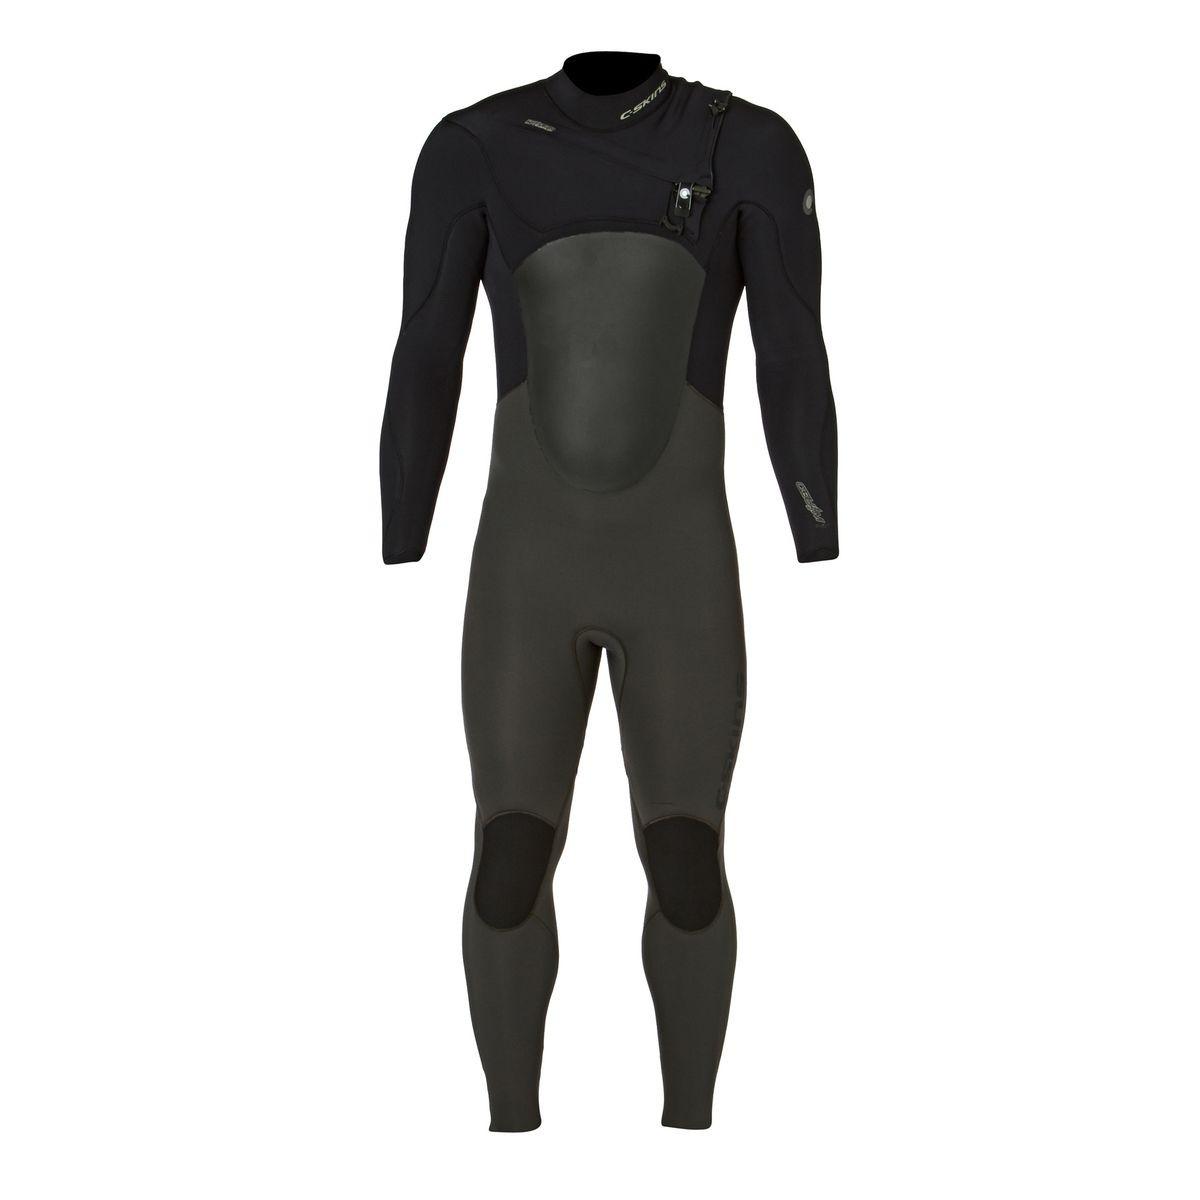 C-Skins Wired 5/4mm 2017 Chest Zip Wetsuit - Grey/ Black